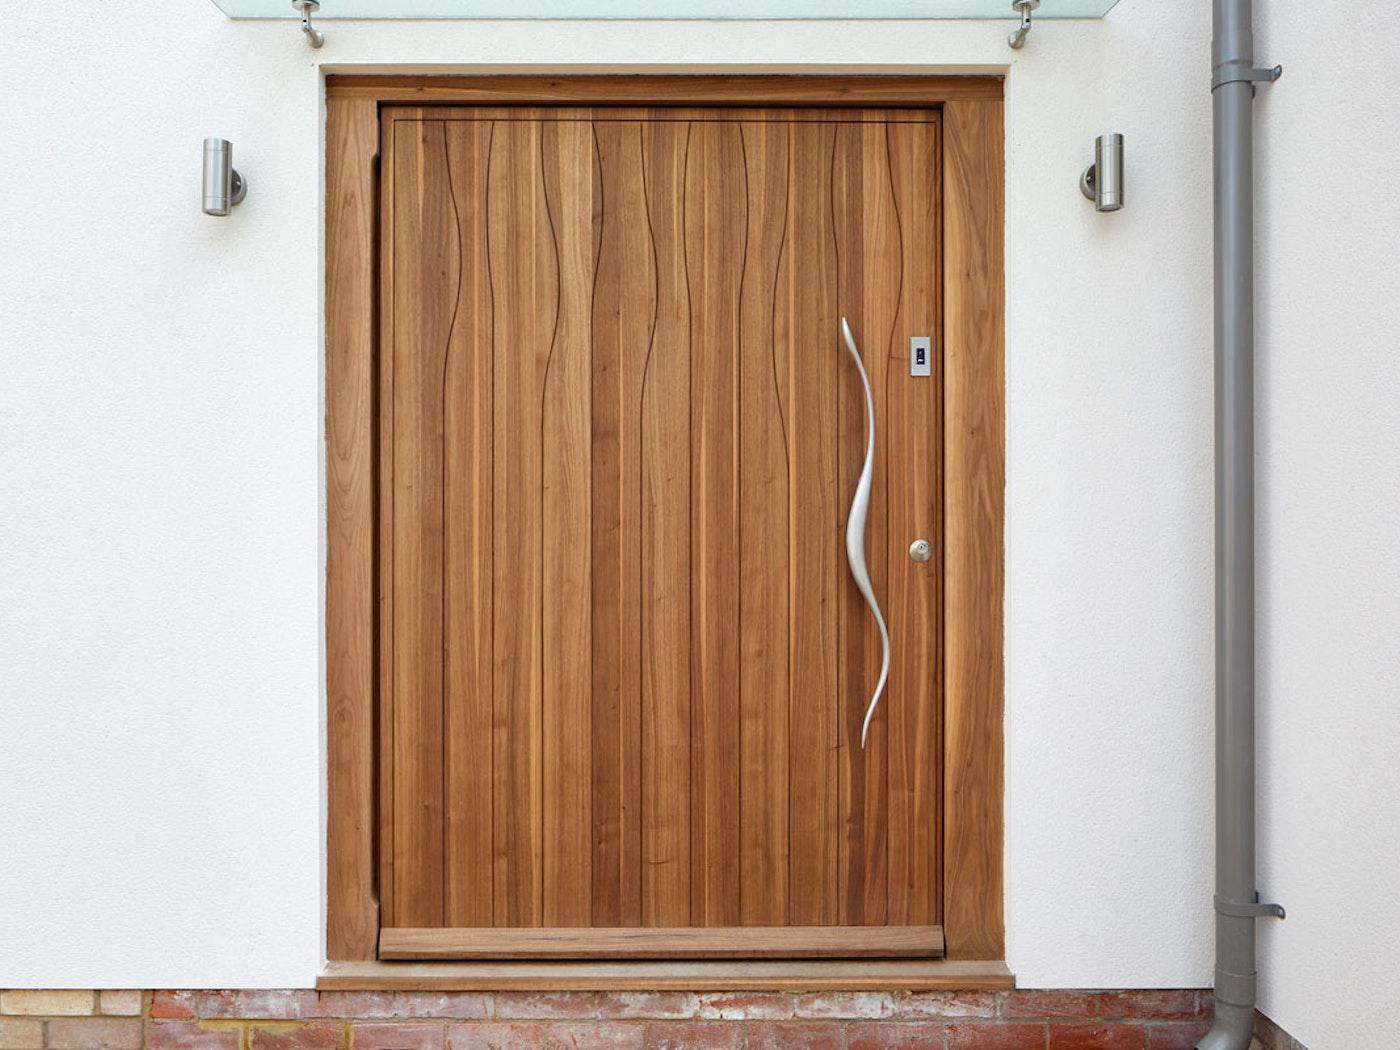 High security front doors | Fingerprint entry | Urban Front